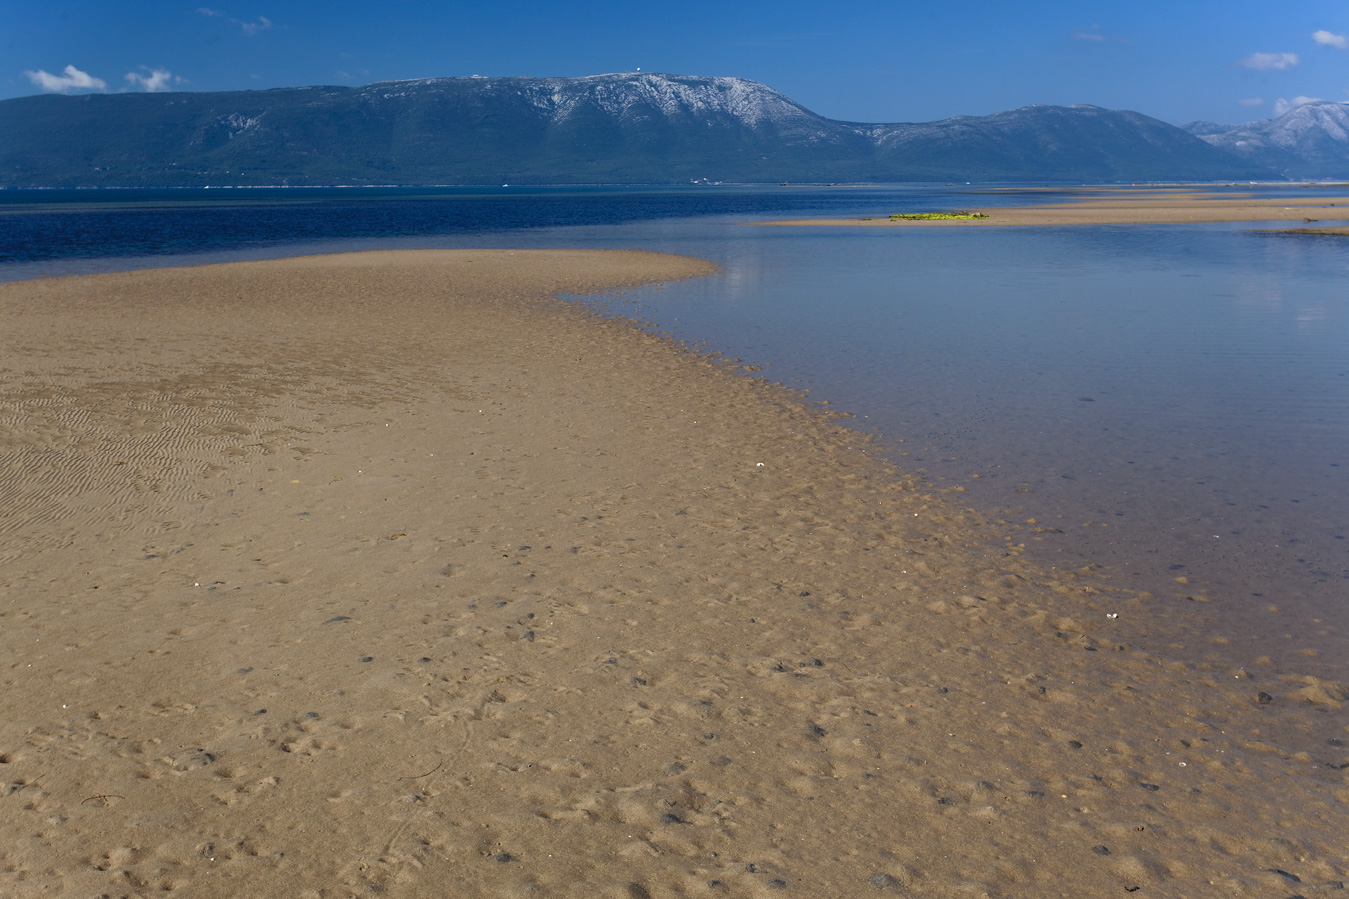 croatia, dalmatia, adriatc, sea, coast, neretva, delta